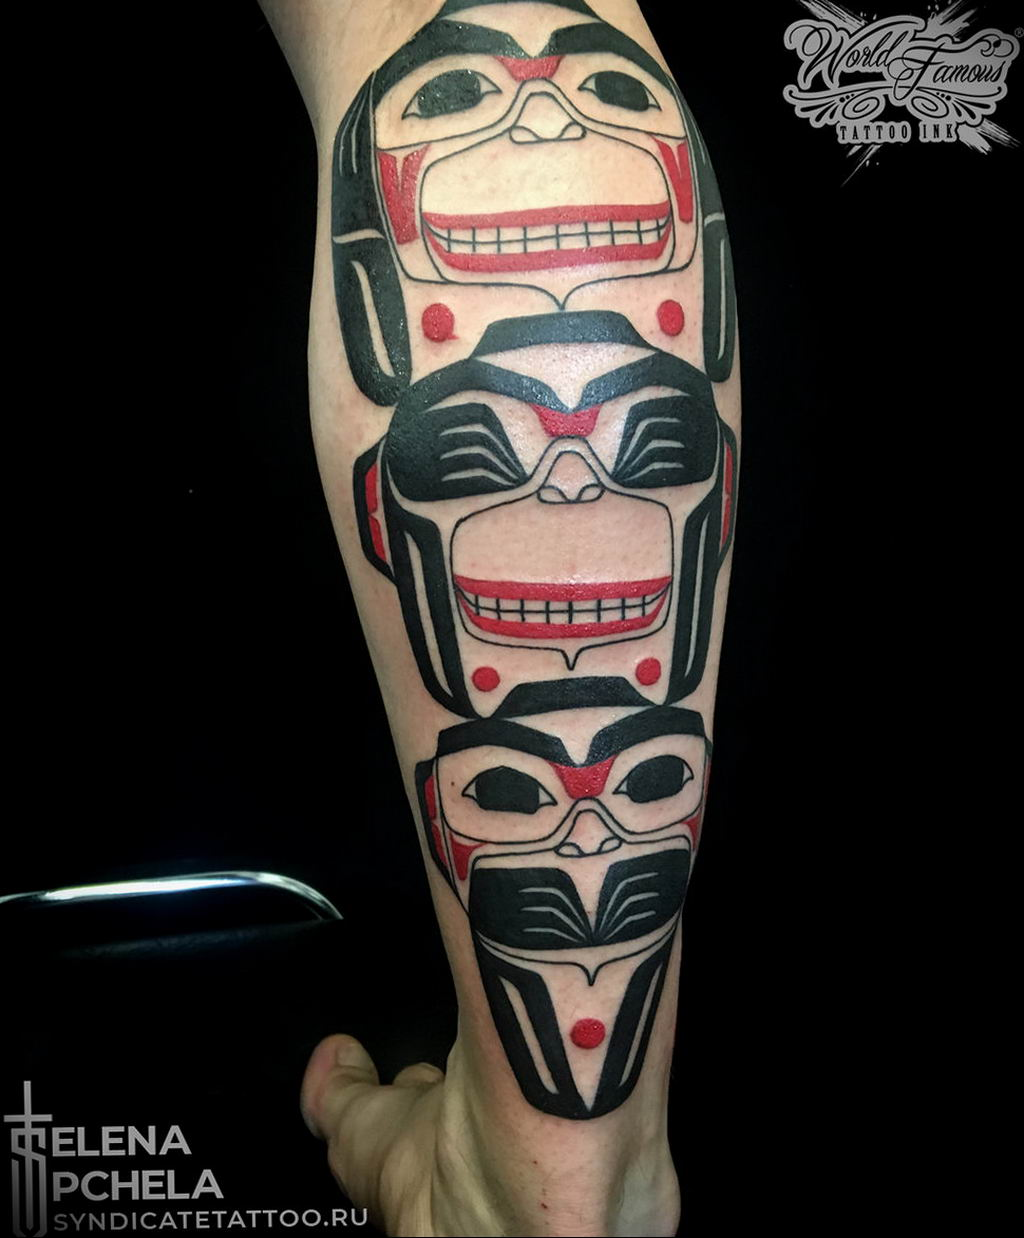 Фото тату студии Синдикат 09.09.2019 №096 - Syndicate tattoo - tatufoto.com